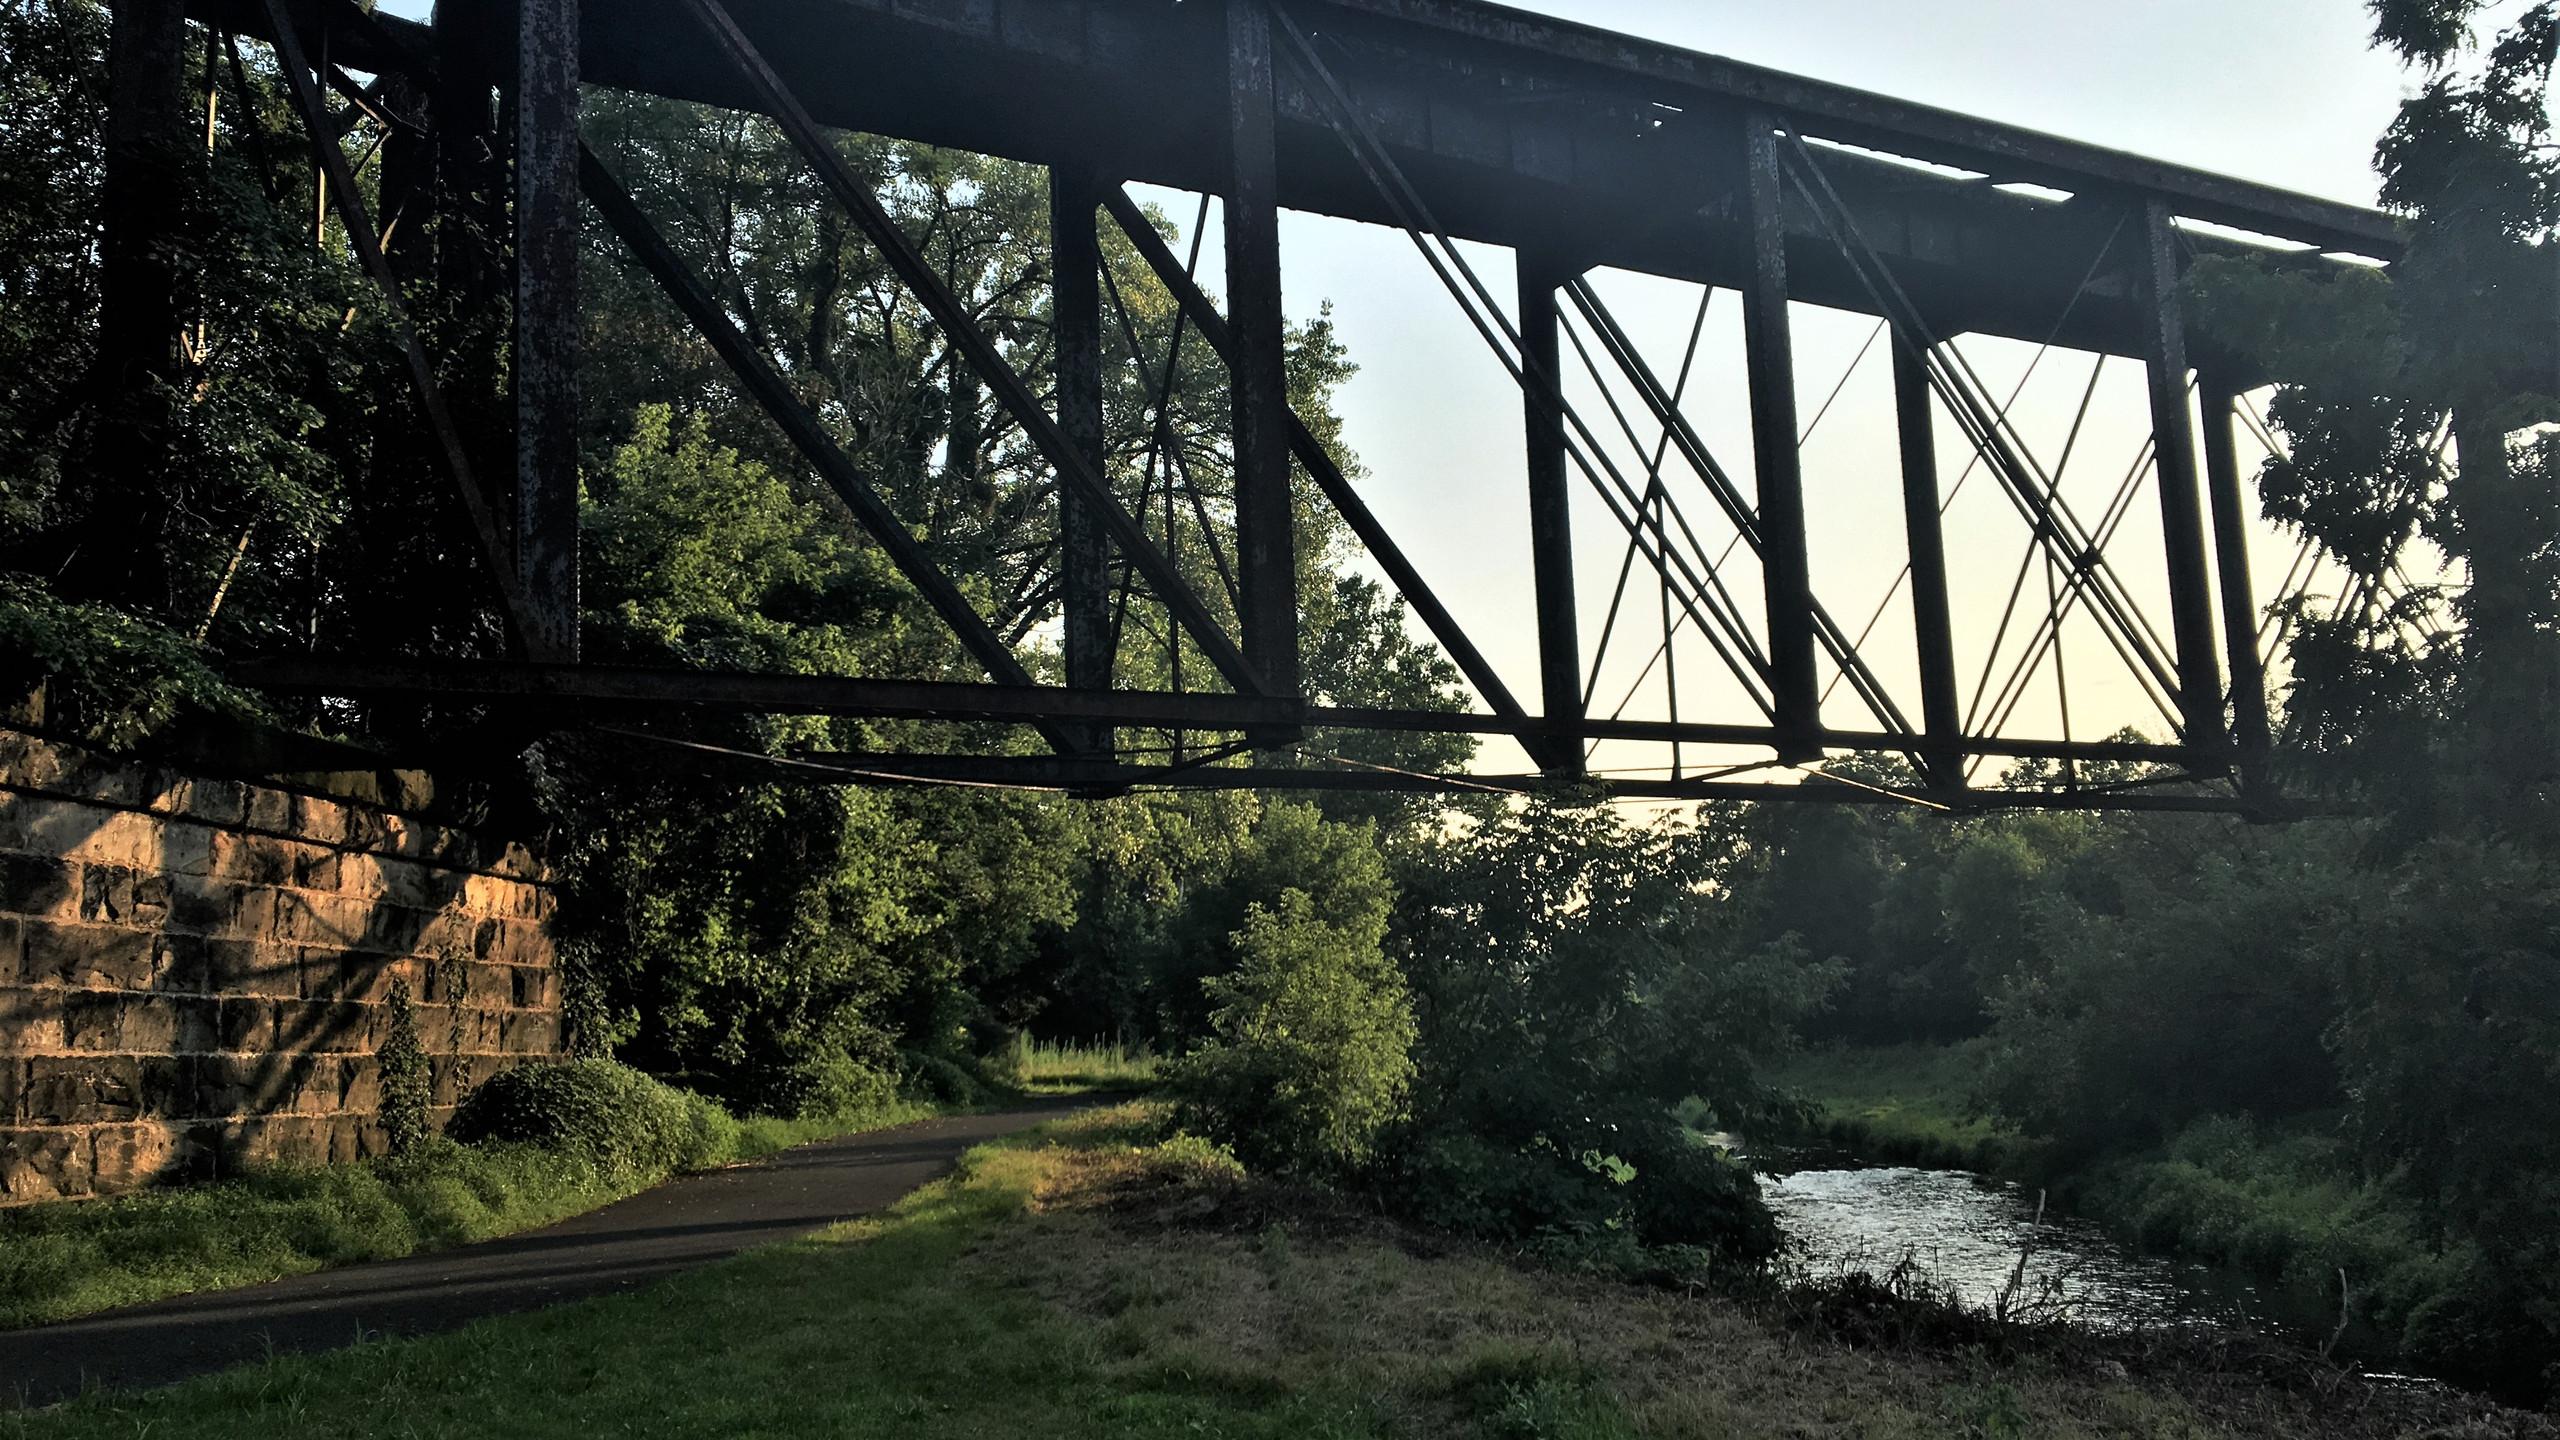 Railroad Trestle across Towpath